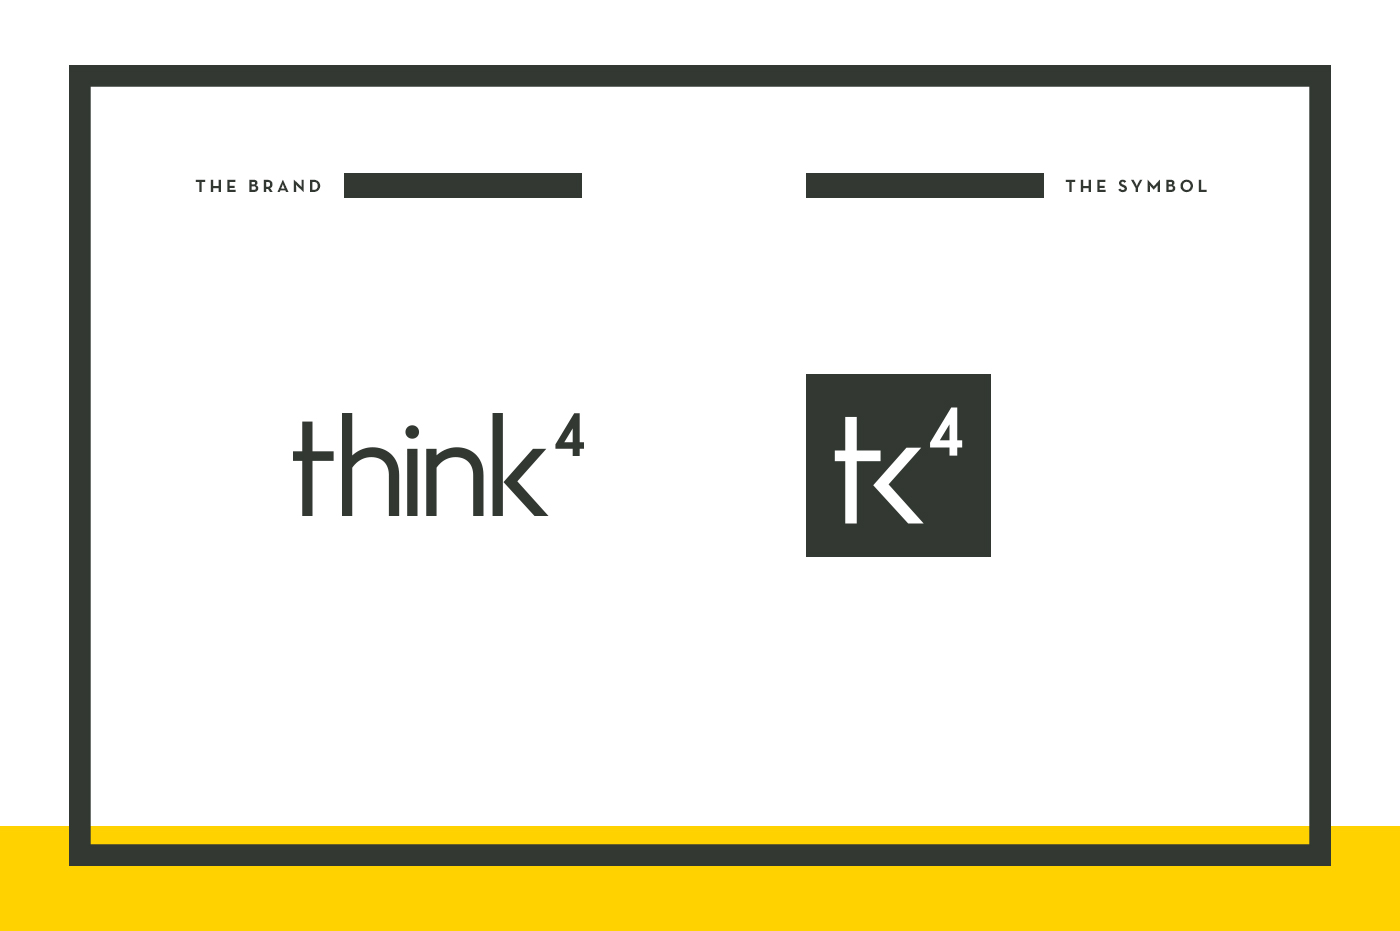 branding  brand identity New brand marca logo Logotipo simbolo symbol modern